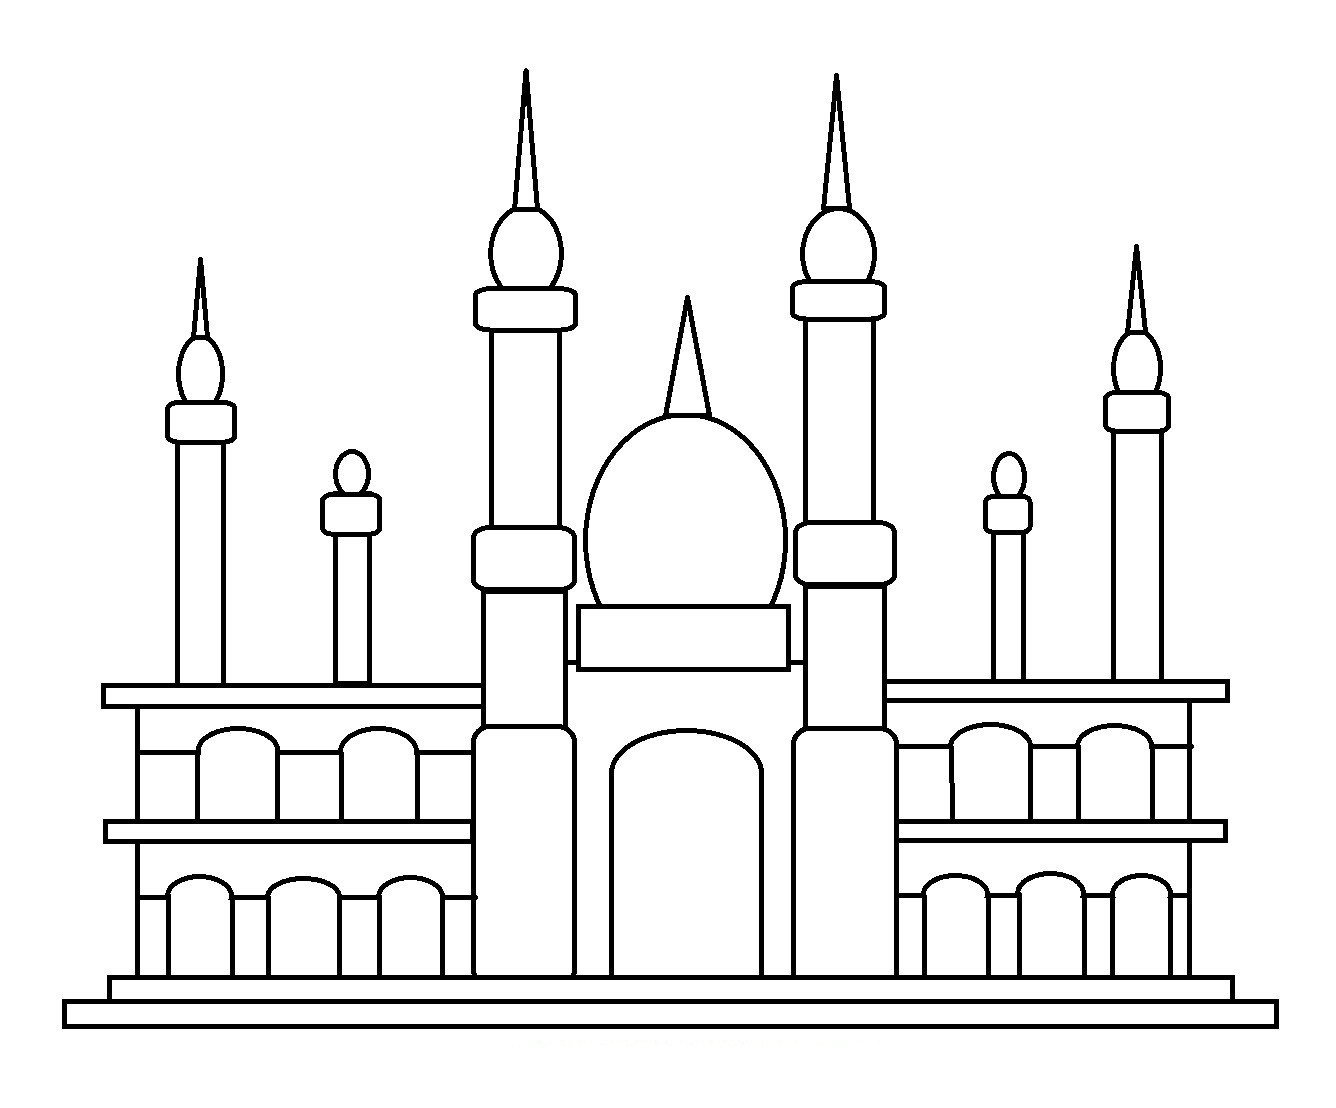 Gambar Masjid Untuk Mewarnai 50 Gambar Mewarnai Yang Seru Dan